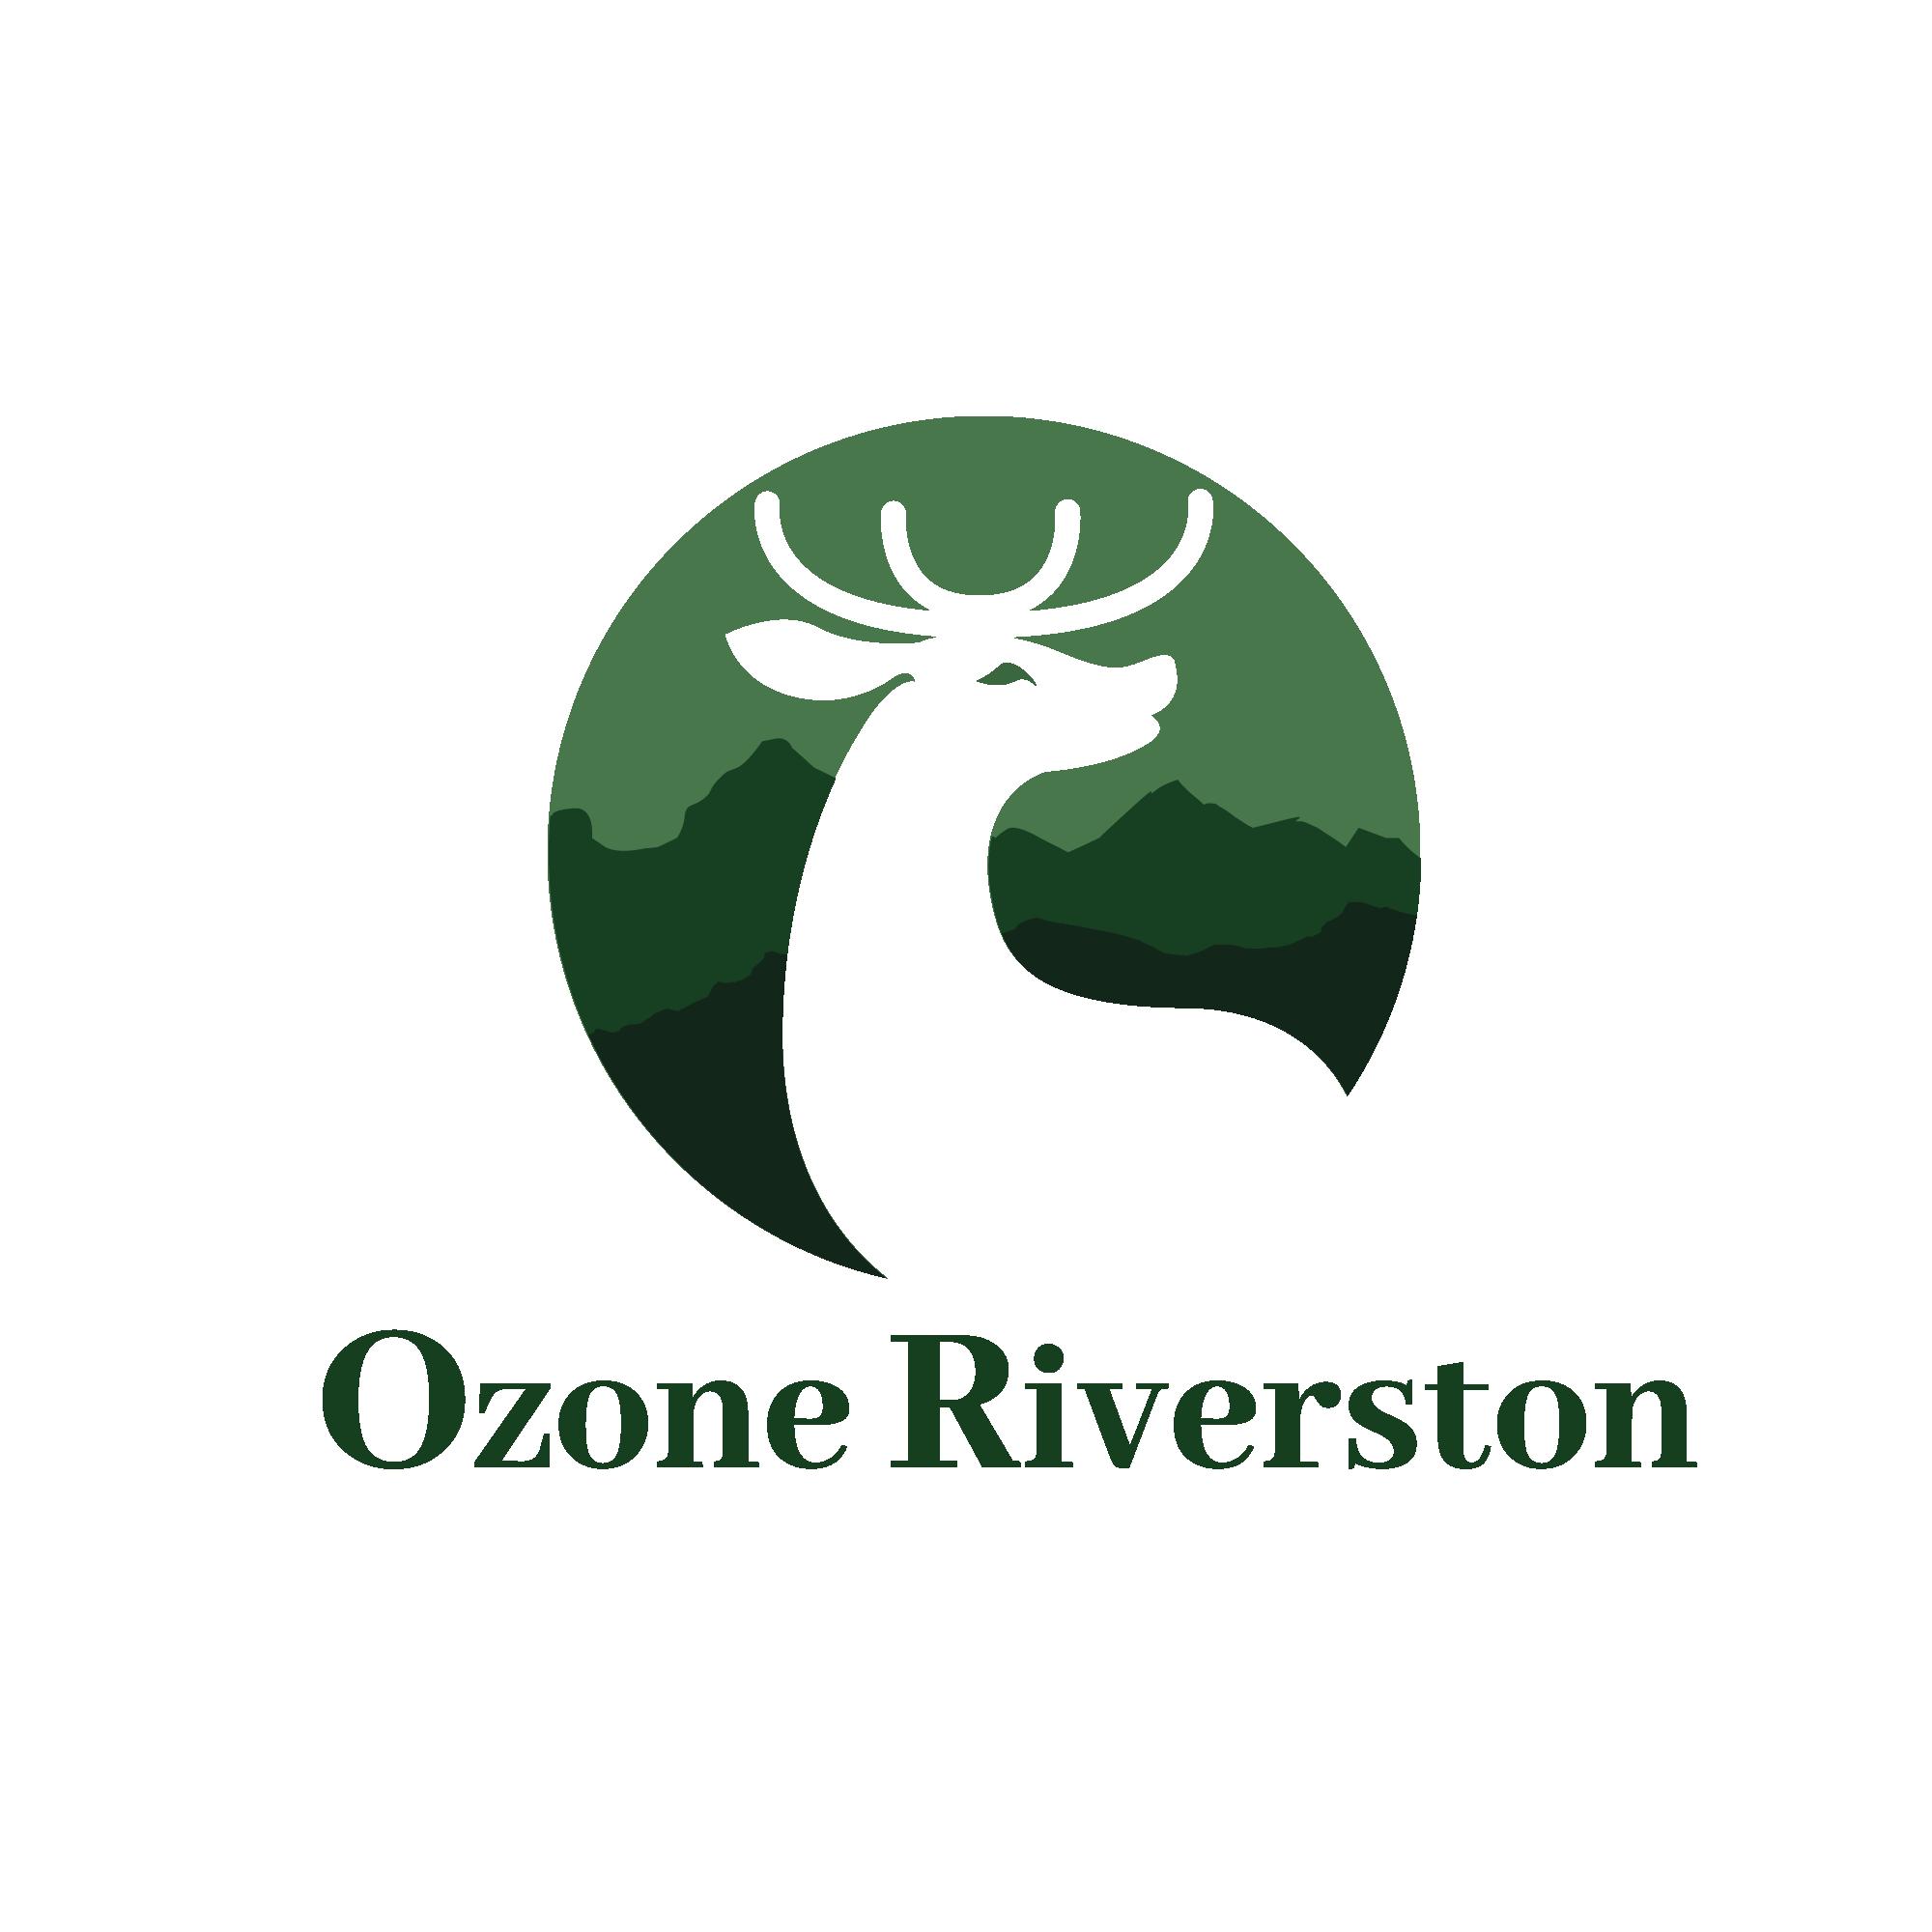 Ozone Riverston